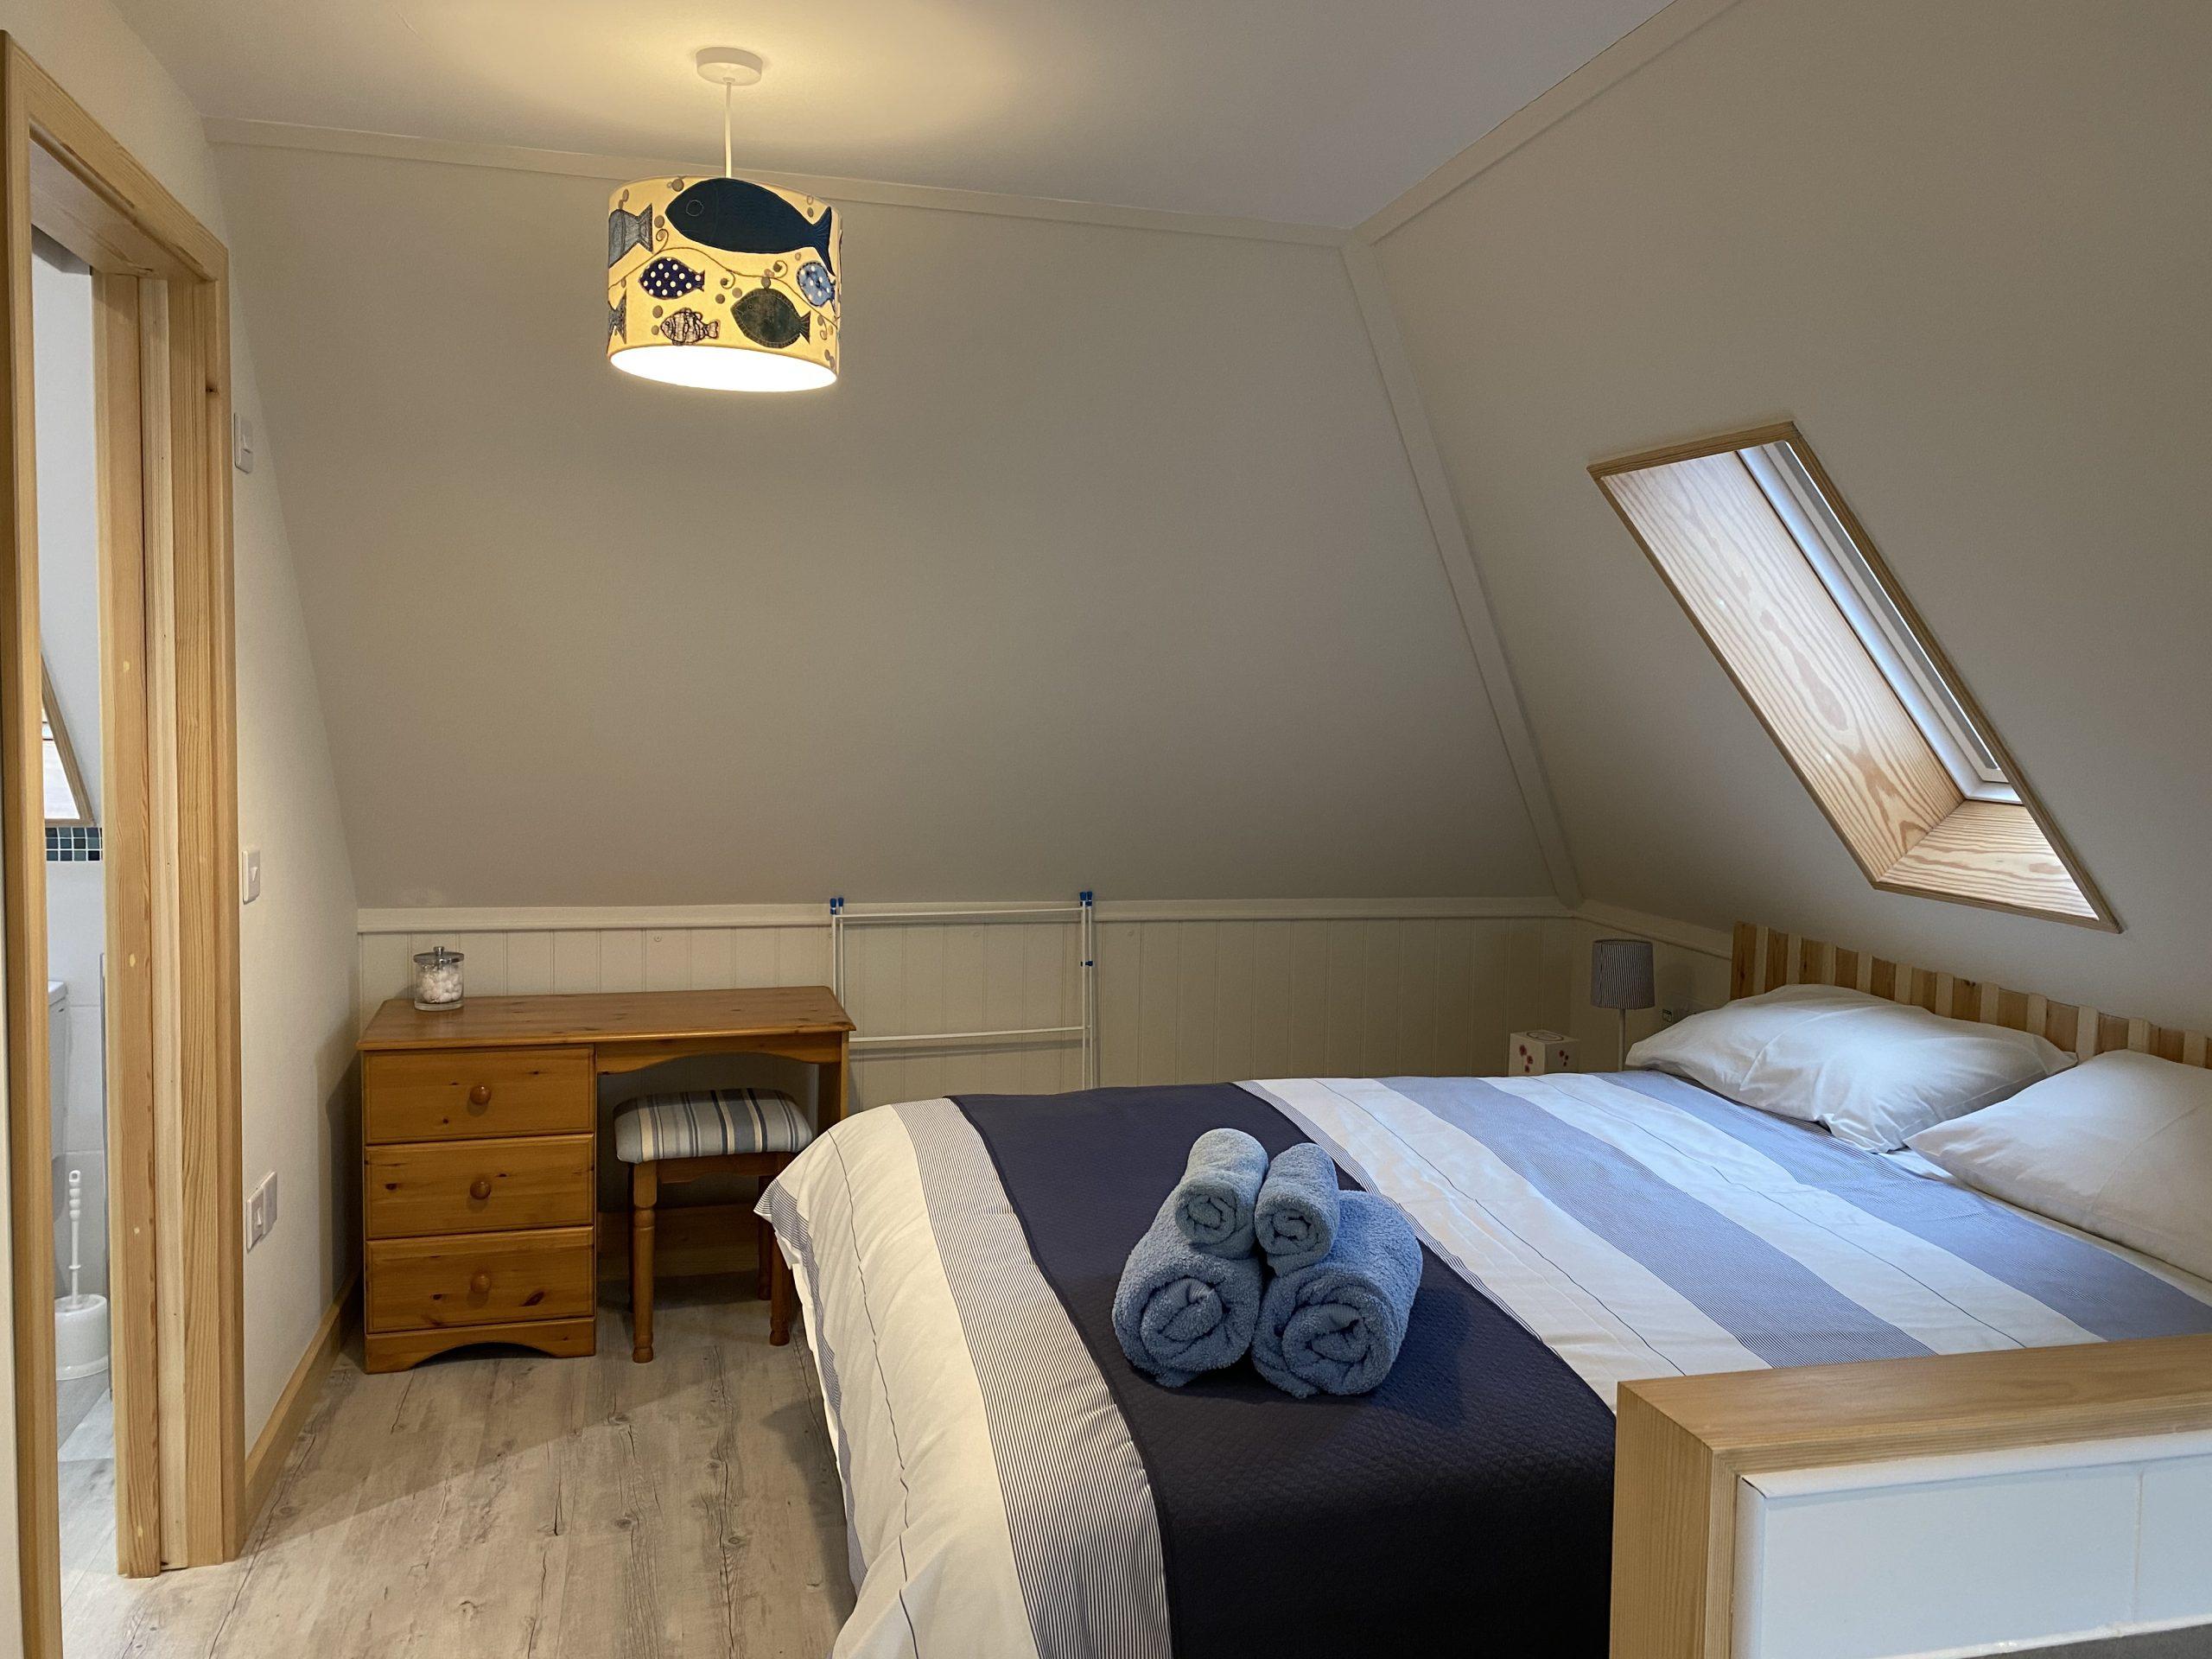 Bowsprit bedroom